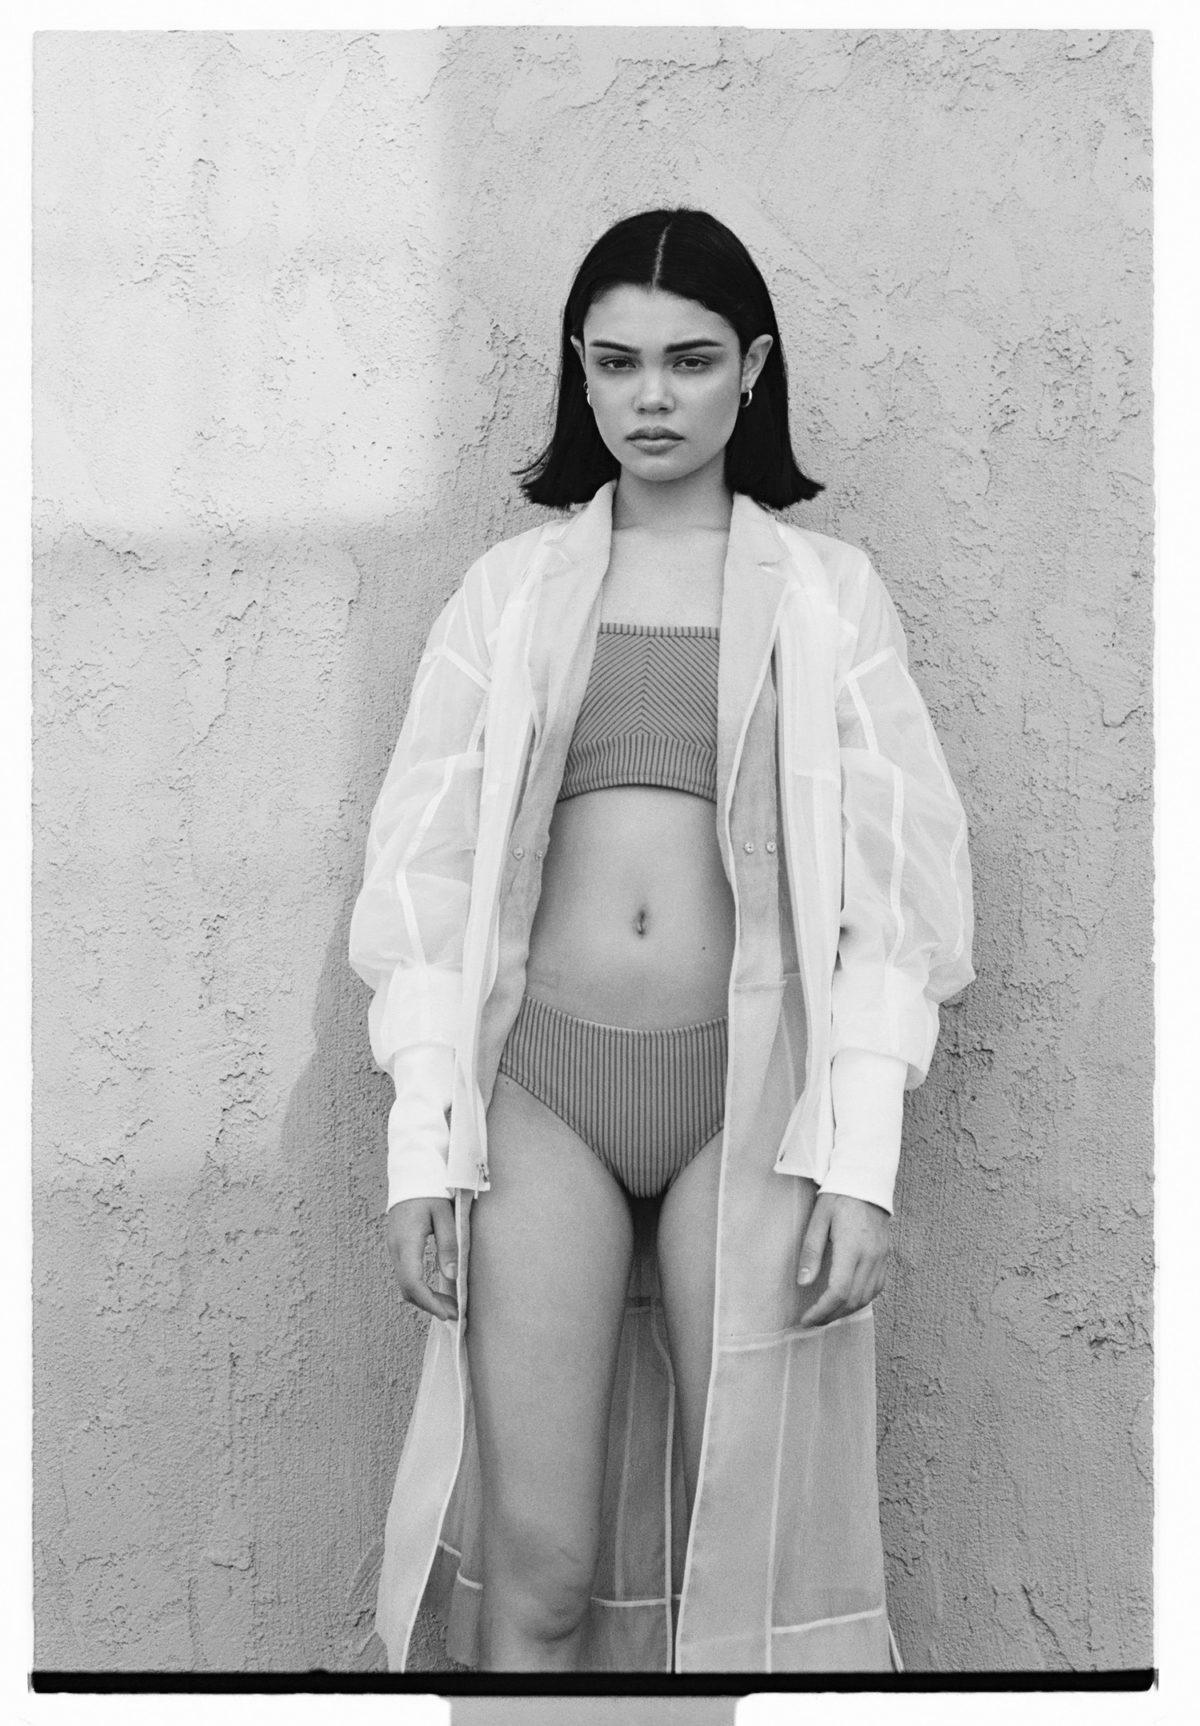 PHOTOGRAPHER CATHARINA PAVITSCHITZ SHOWS THE BEAUTY OF WHITE DRESSING